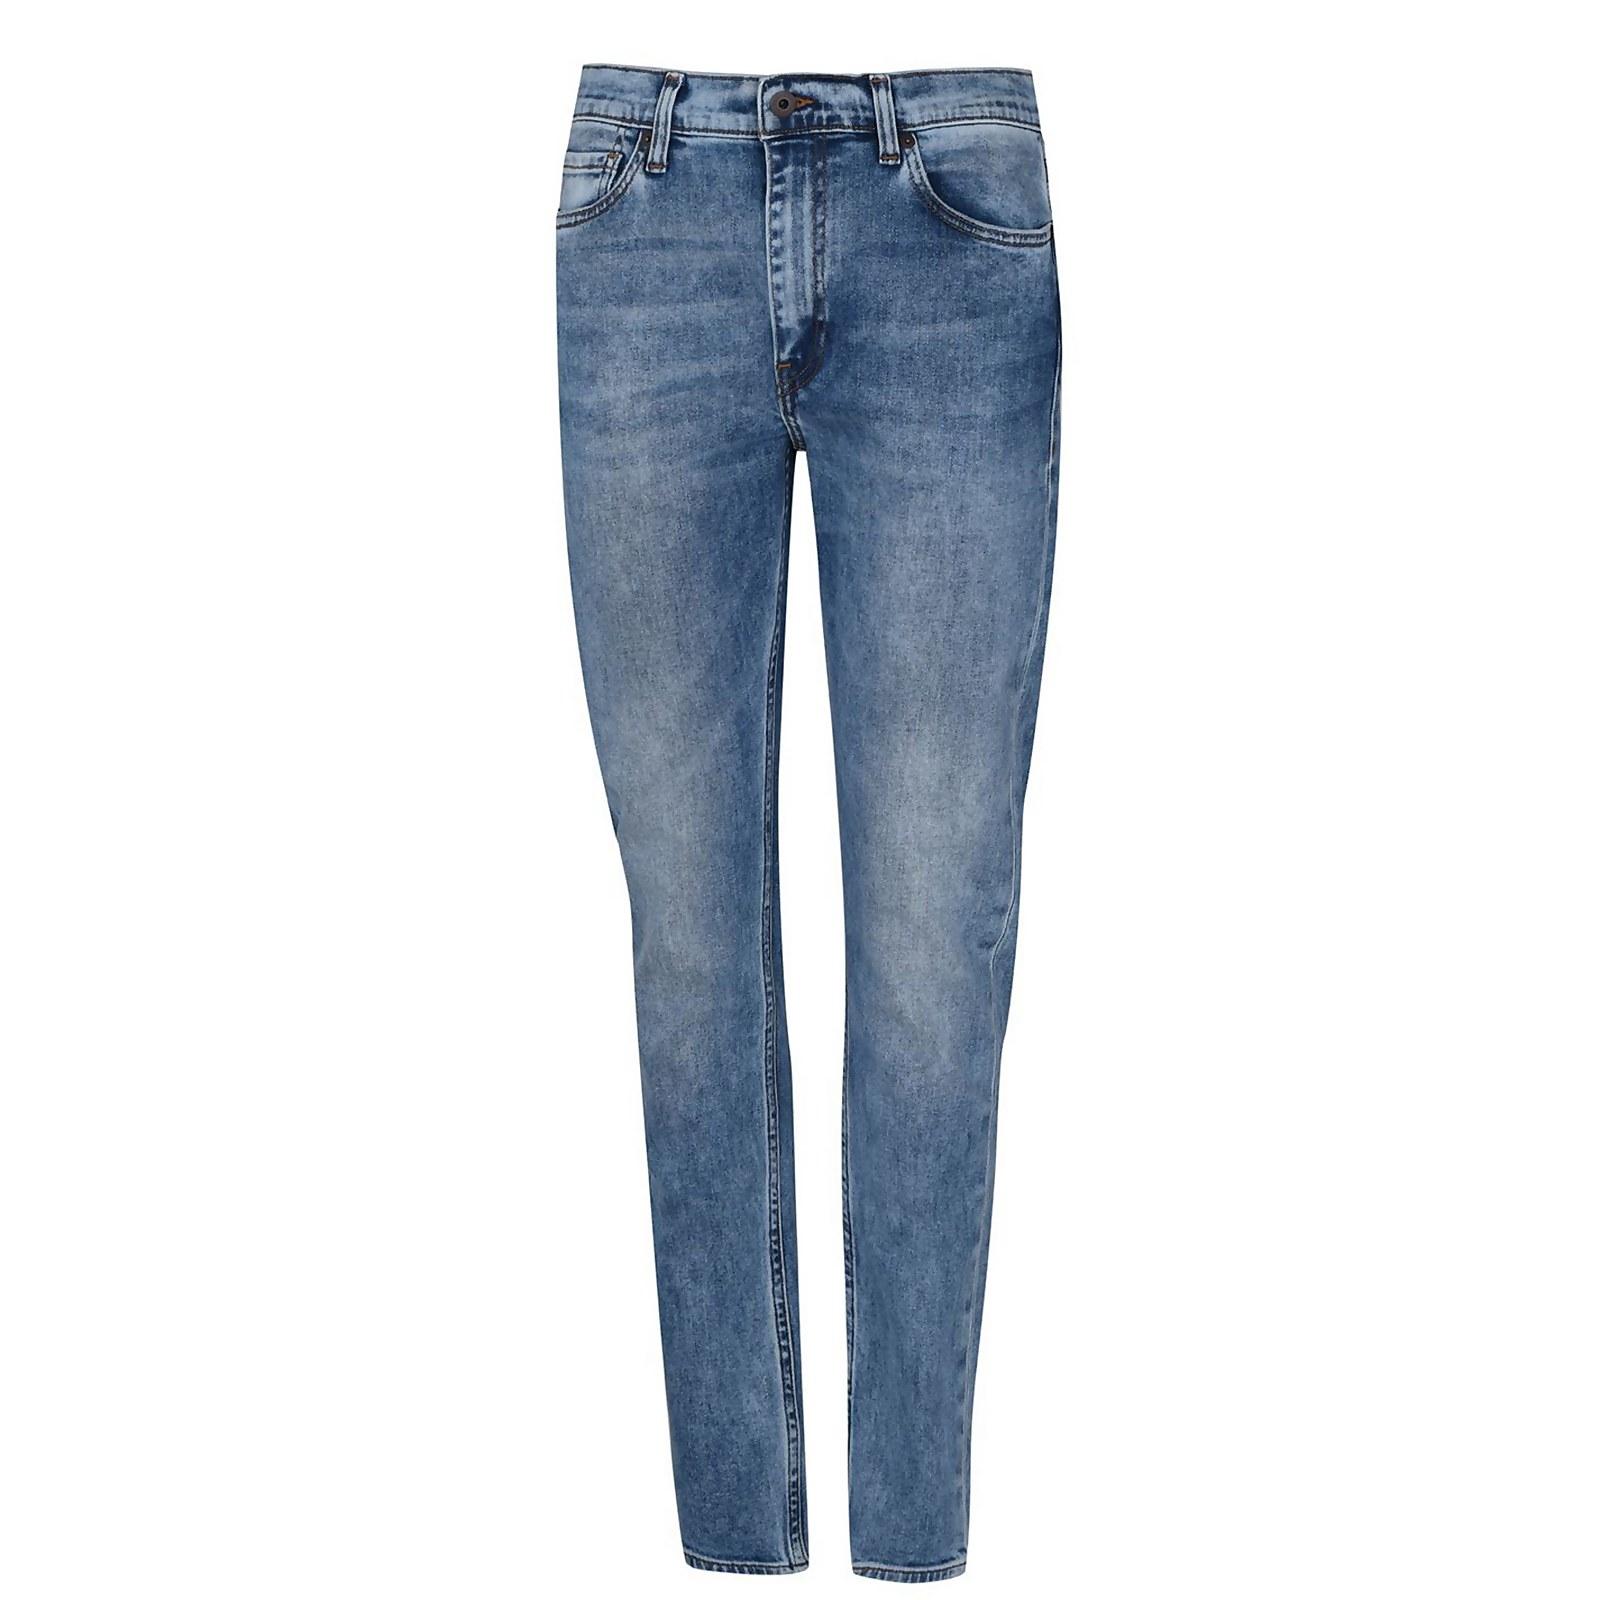 Skinny Jeans - Pale Blue - 30R